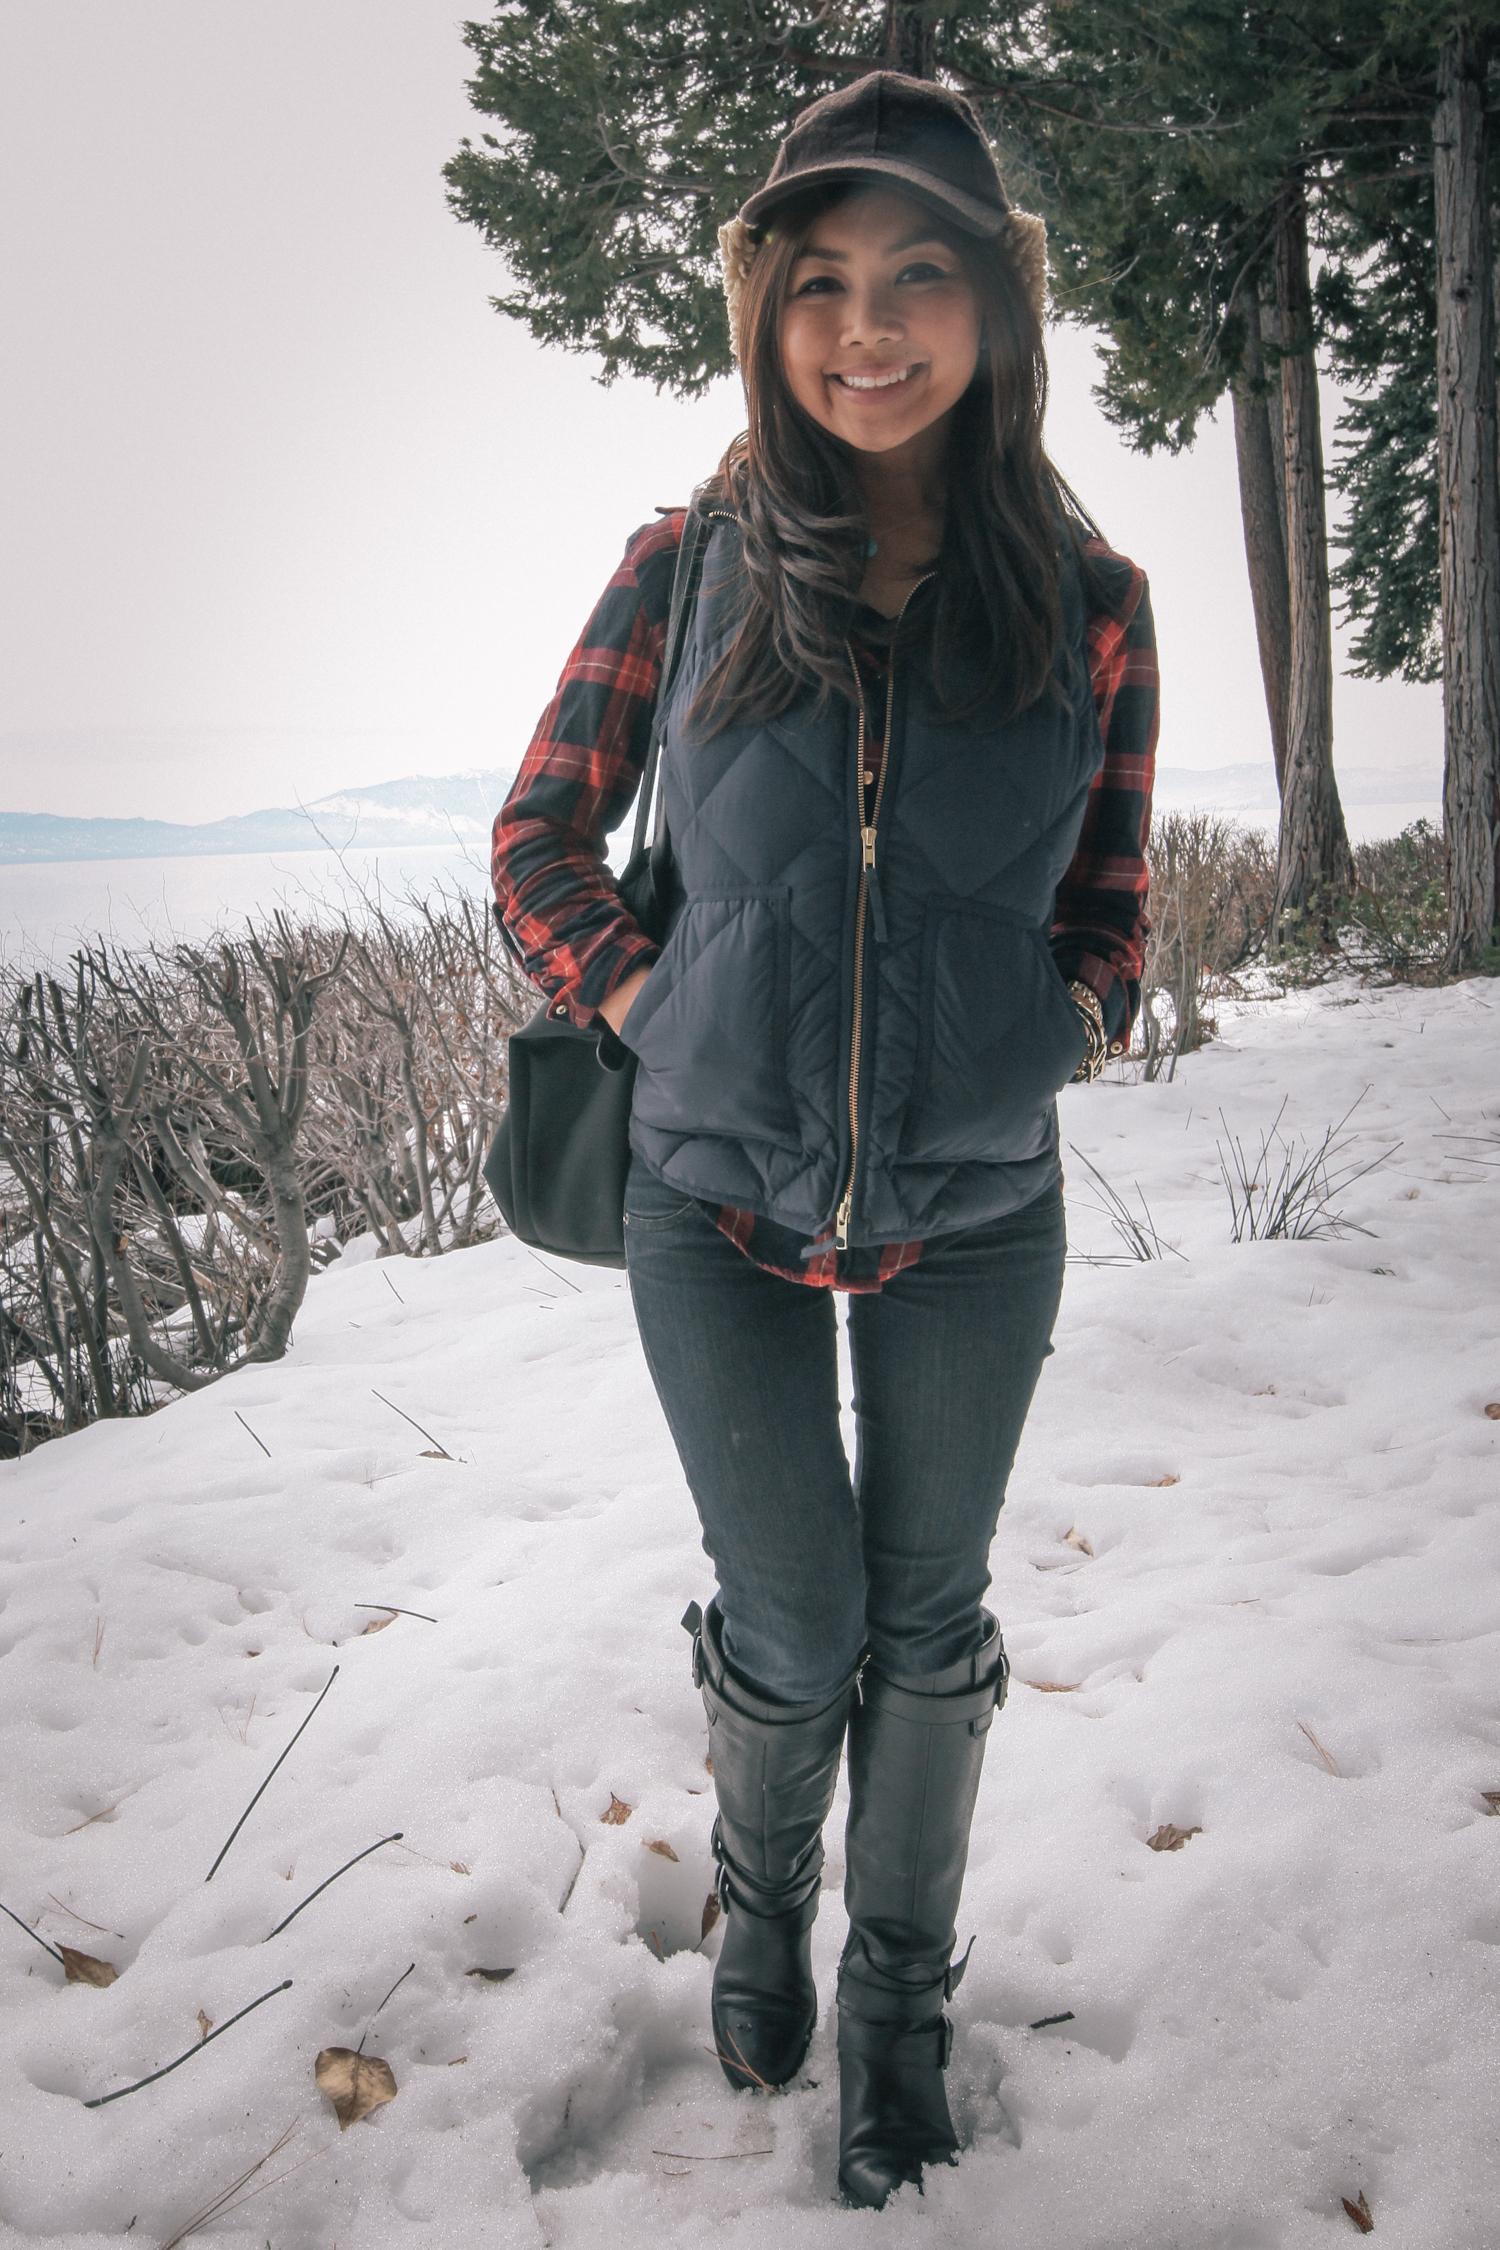 Zara plaid shirt. Jcrew vest. LF jeans, Enzo Angiolini boots